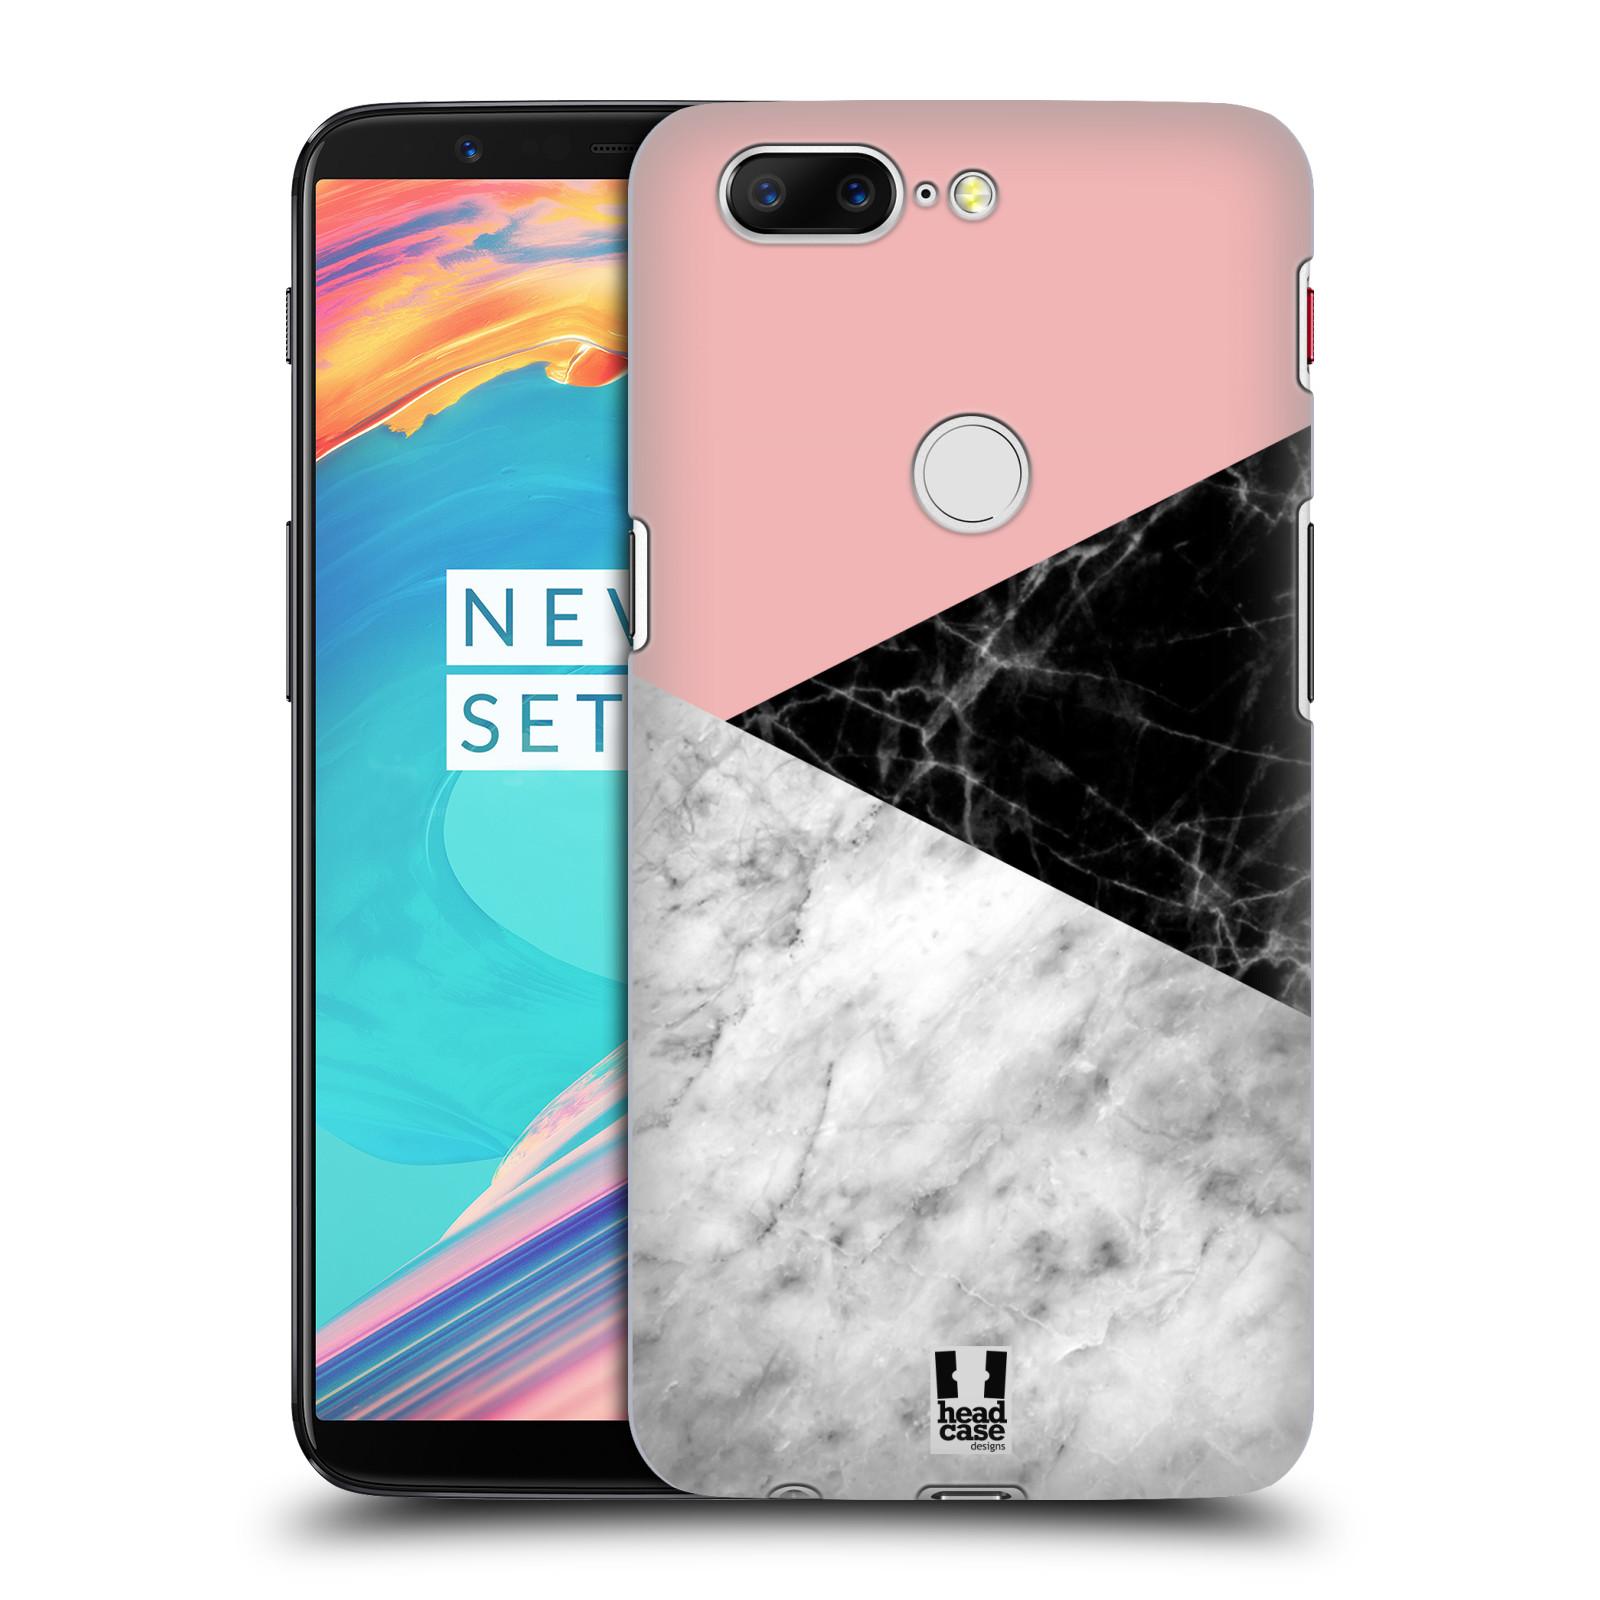 Plastové pouzdro na mobil OnePlus 5T - Head Case - Mramor mix